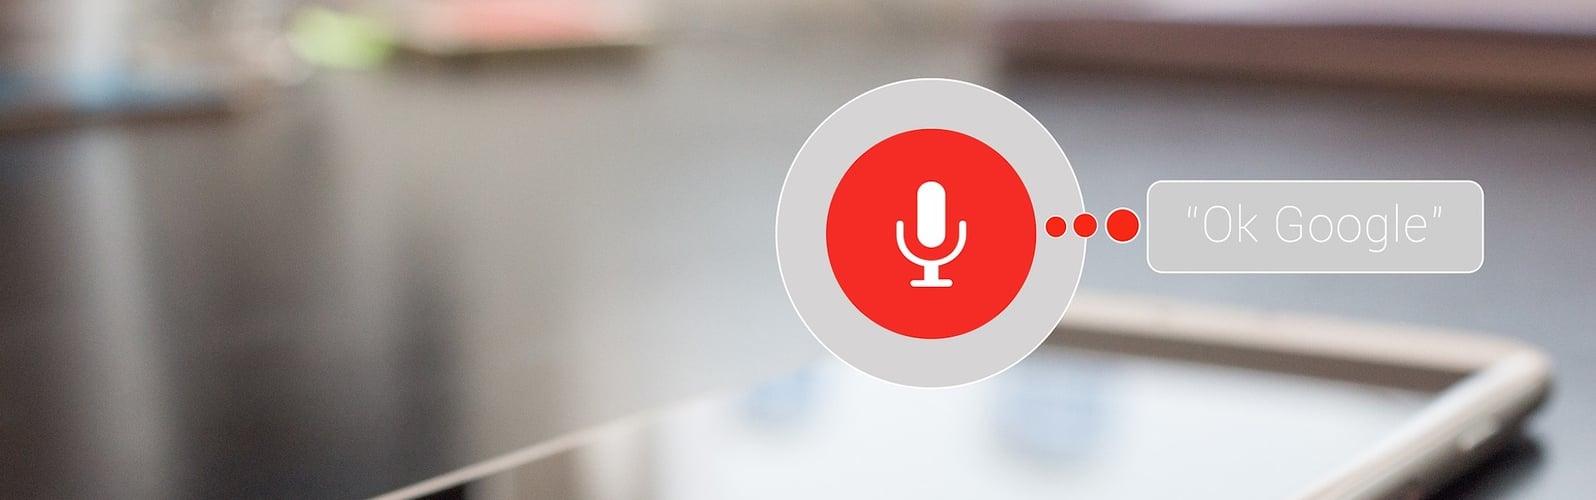 voice-control-2598422_1920